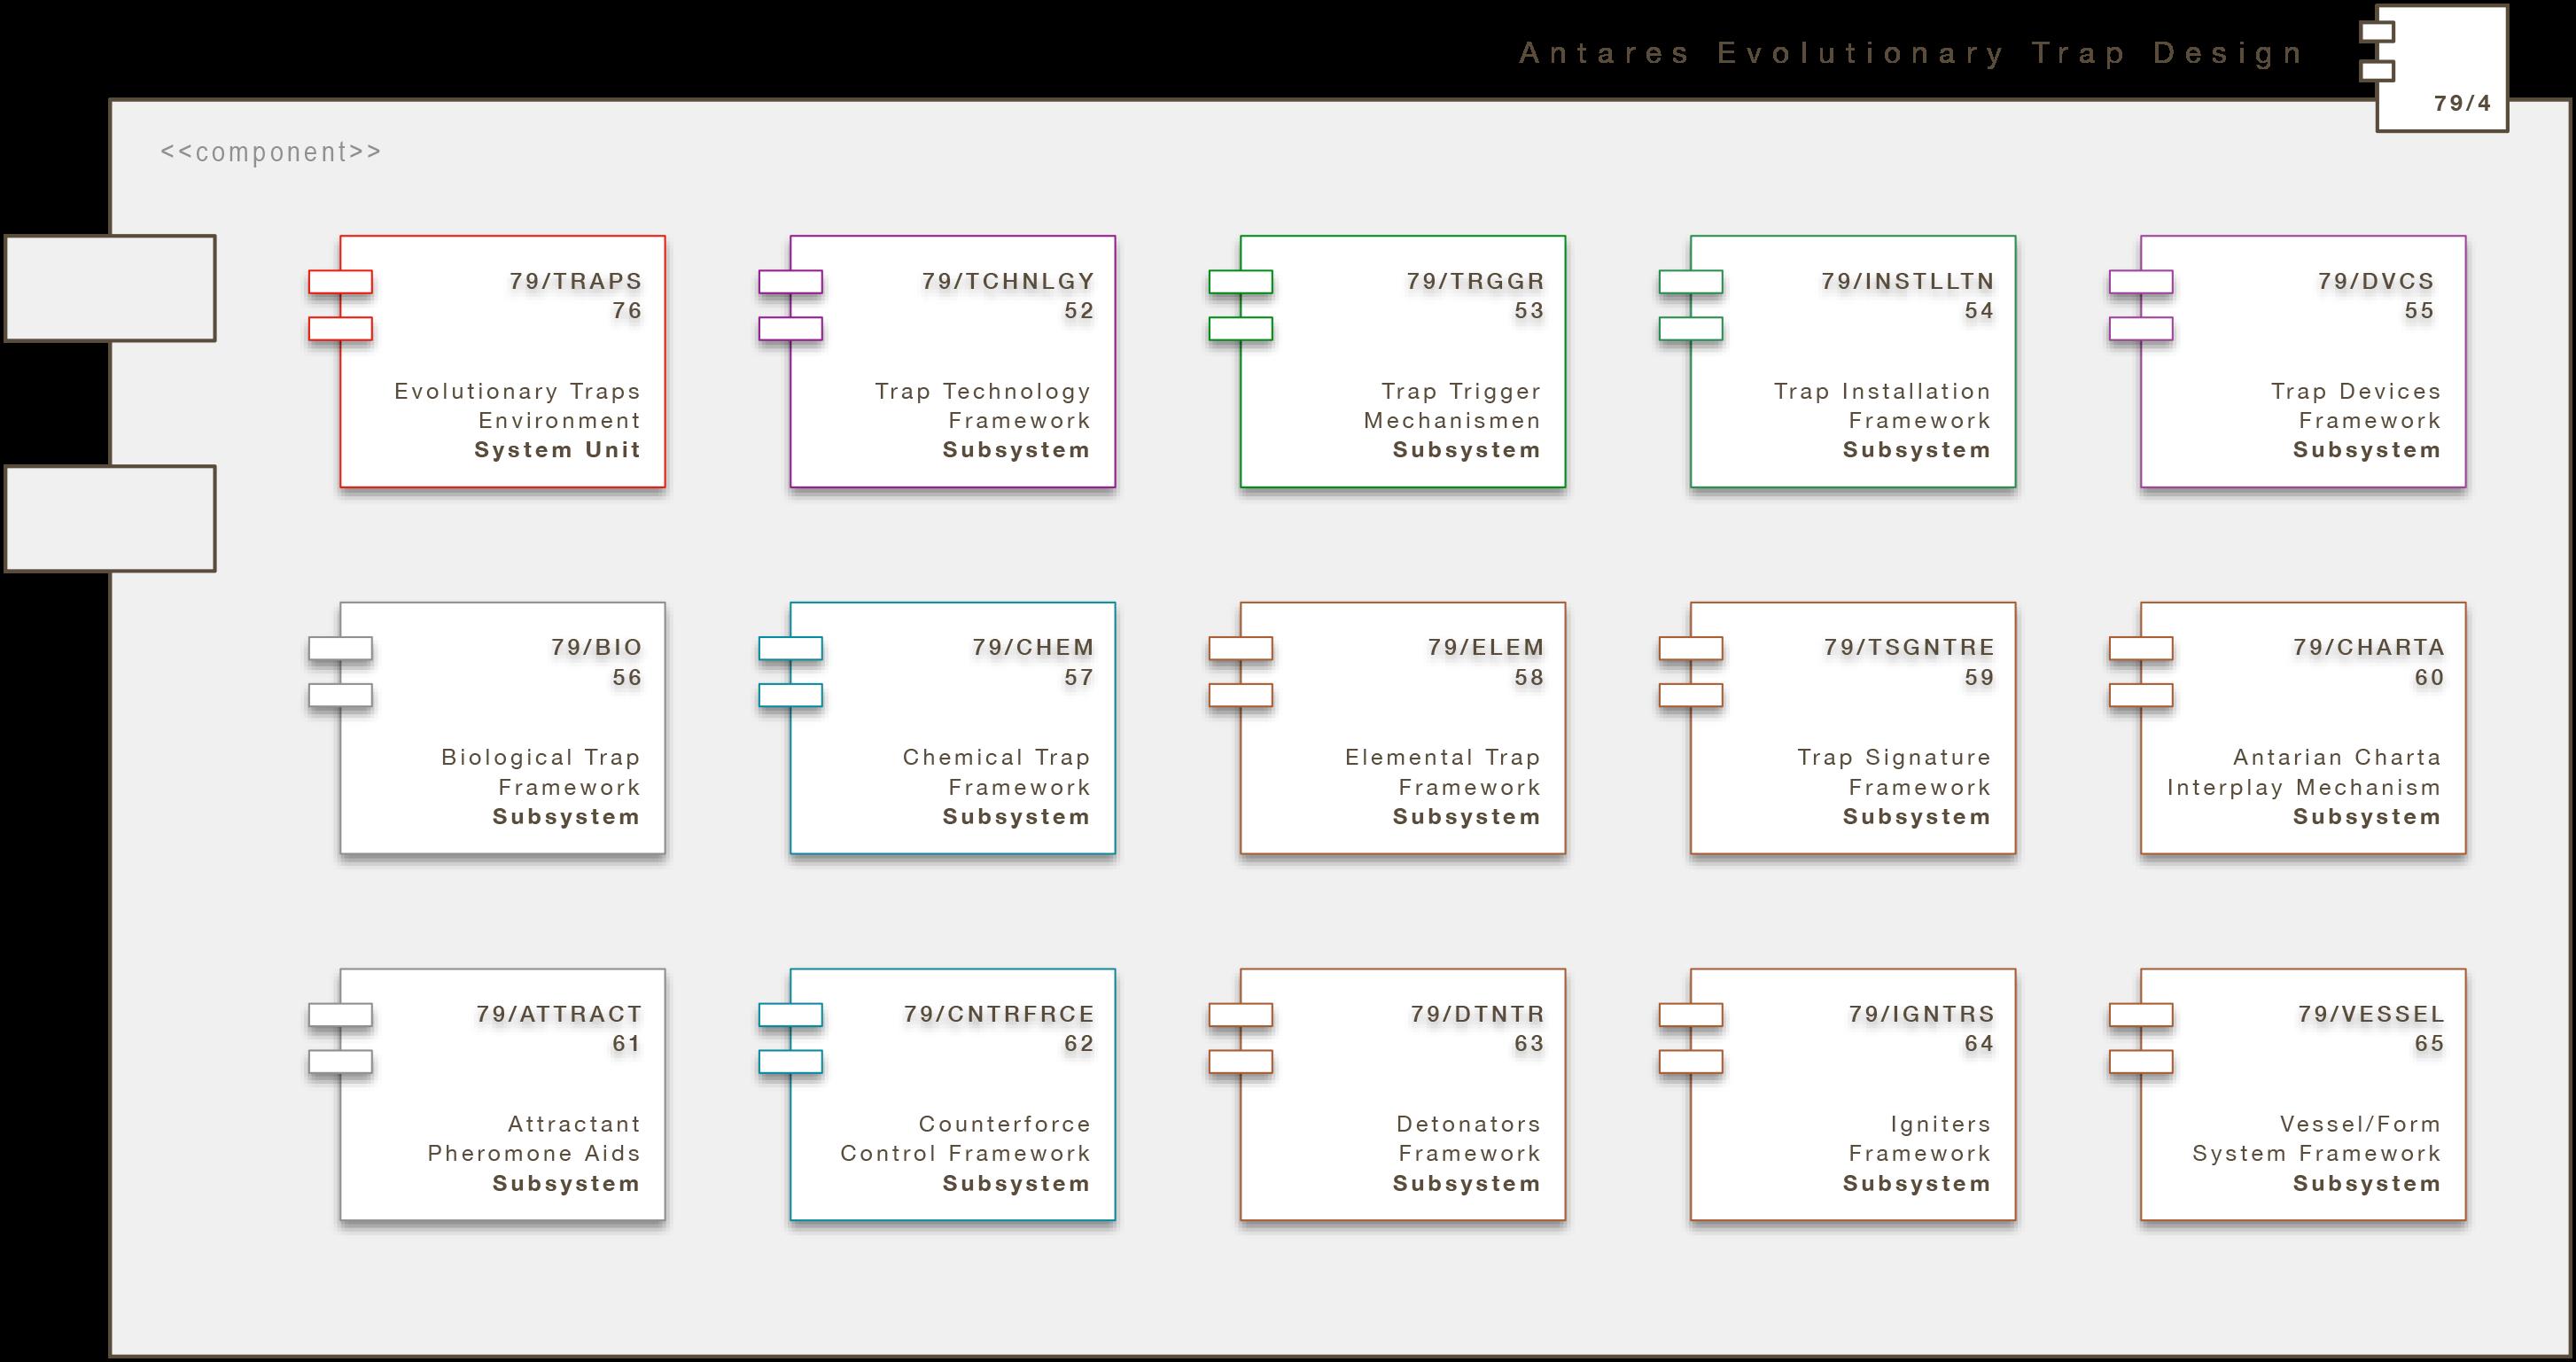 Core Engine Modul: Antares Evolutionary Trap Design (A/ETD)